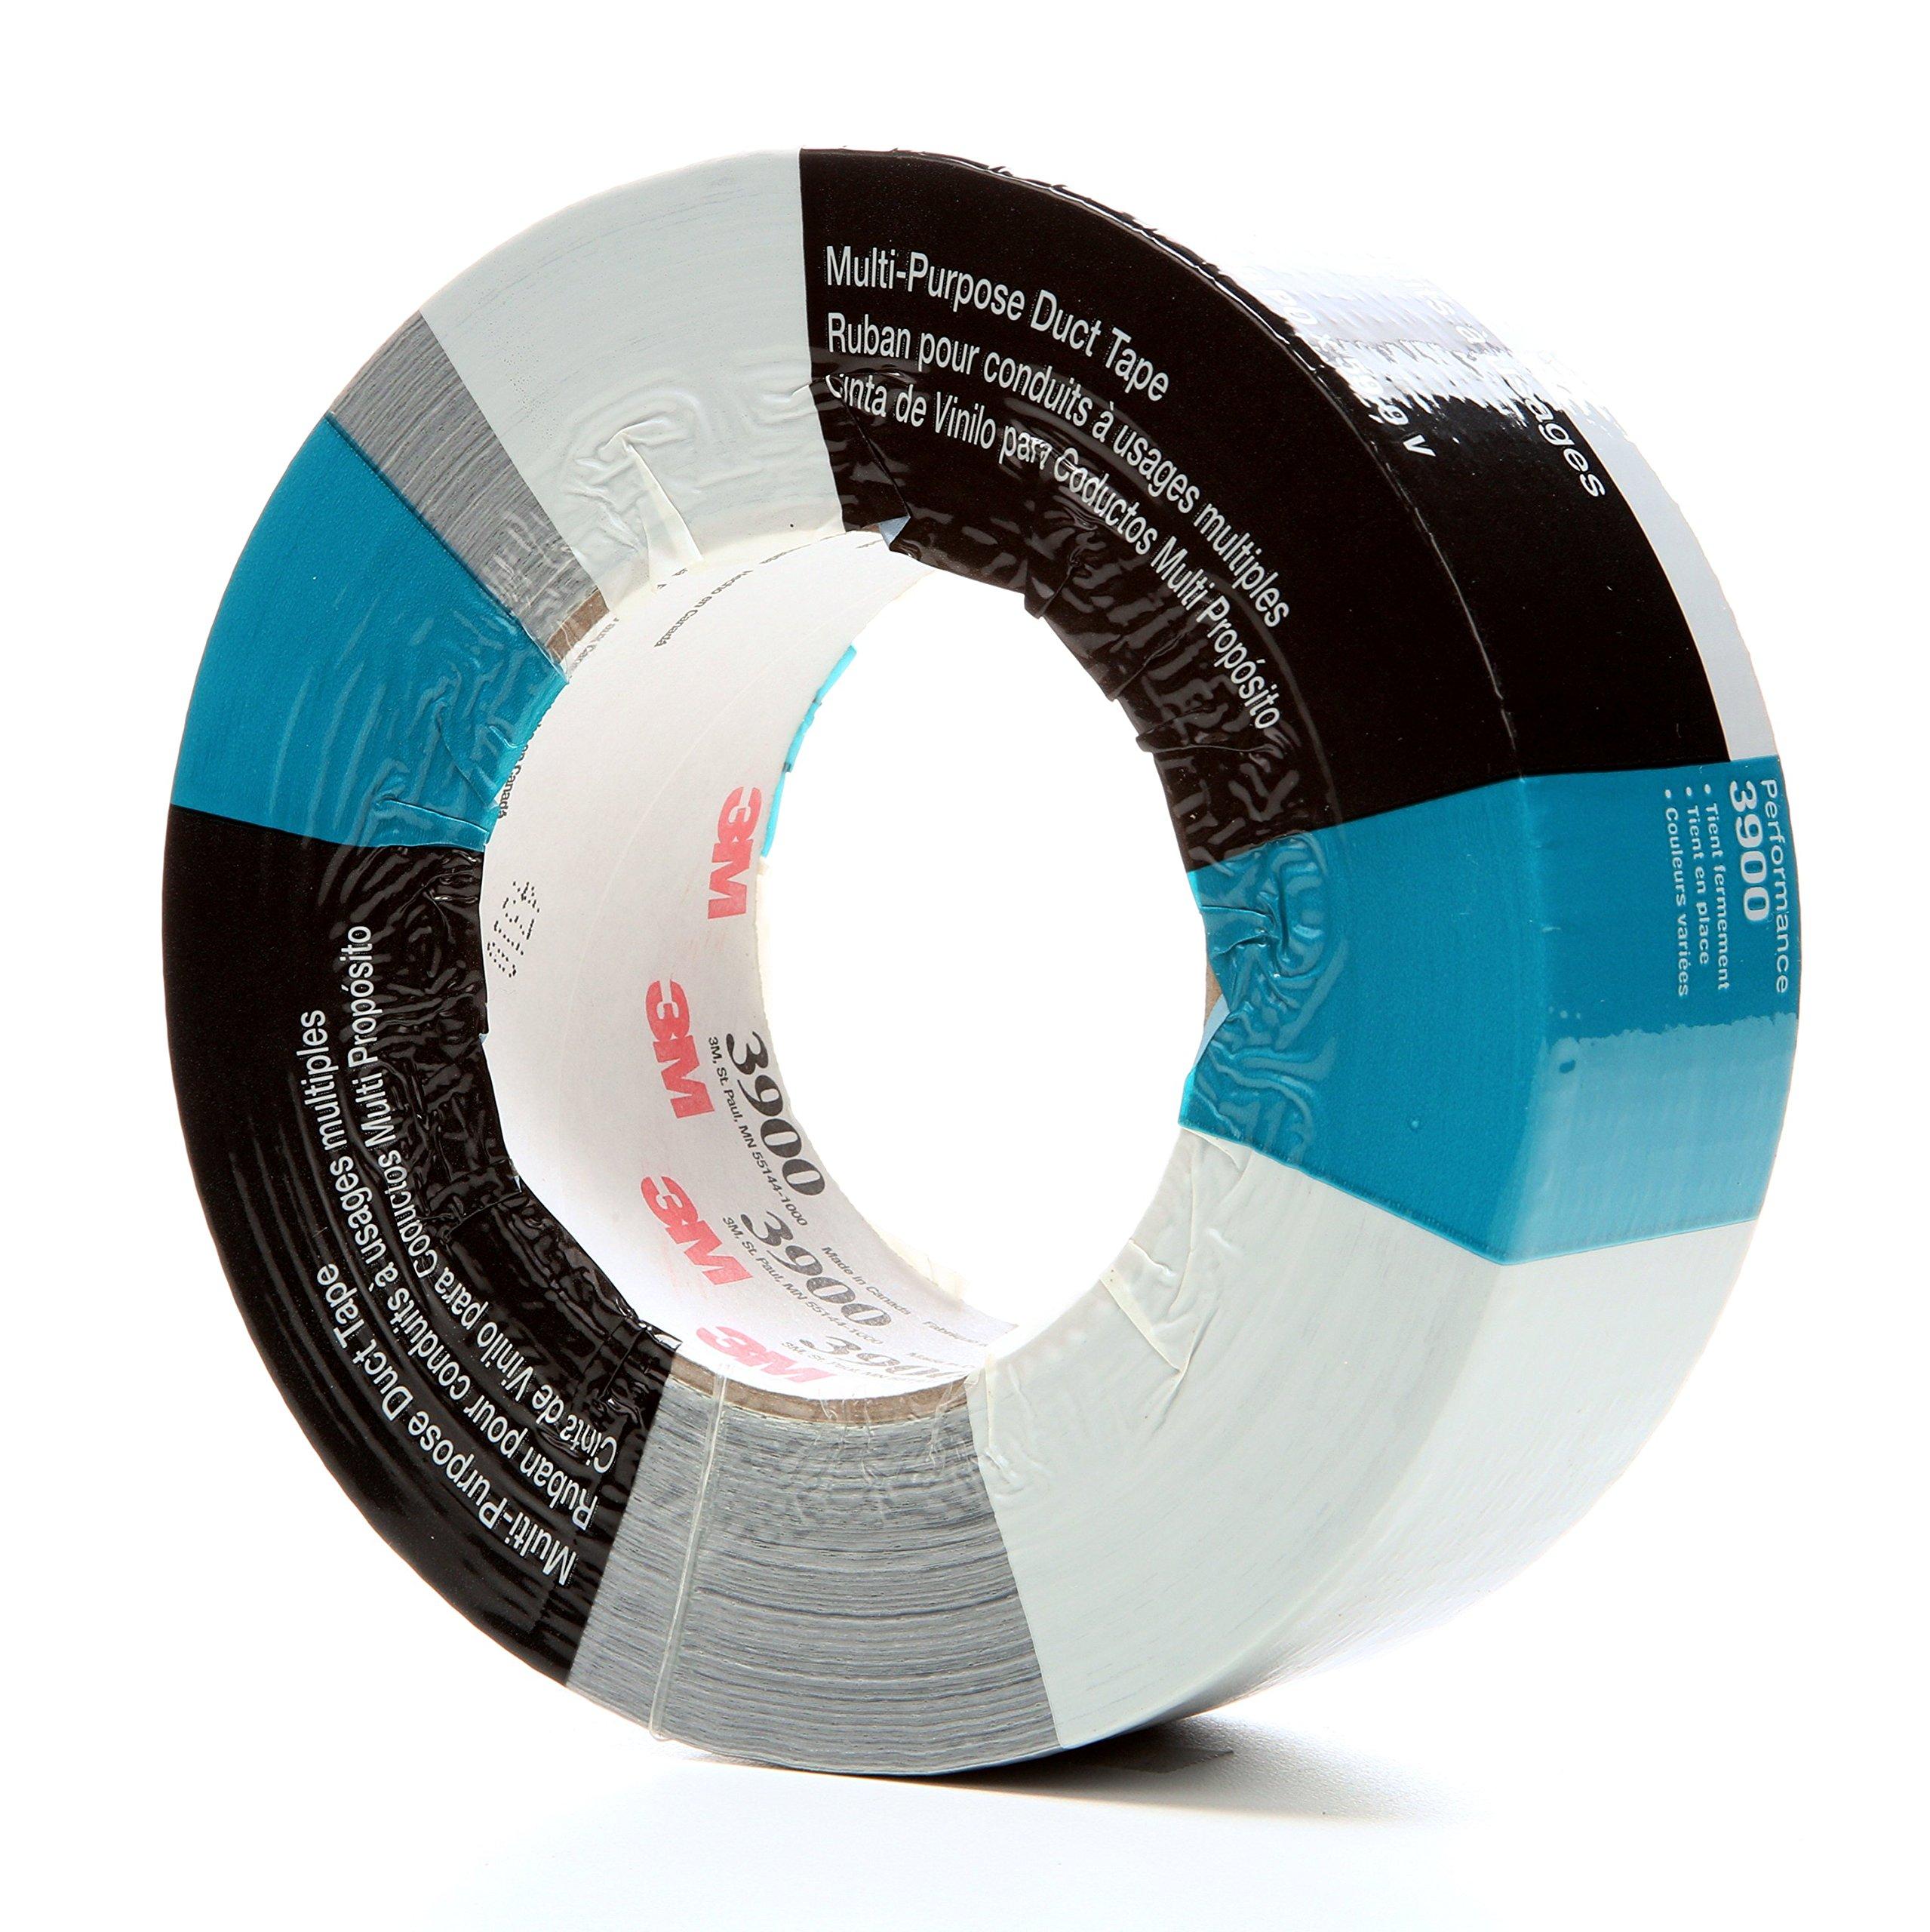 3M Multi-Purpose Duct Tape 3900 Silver, 48 mm x 54.8 m 7.7 mil (MMM3900)